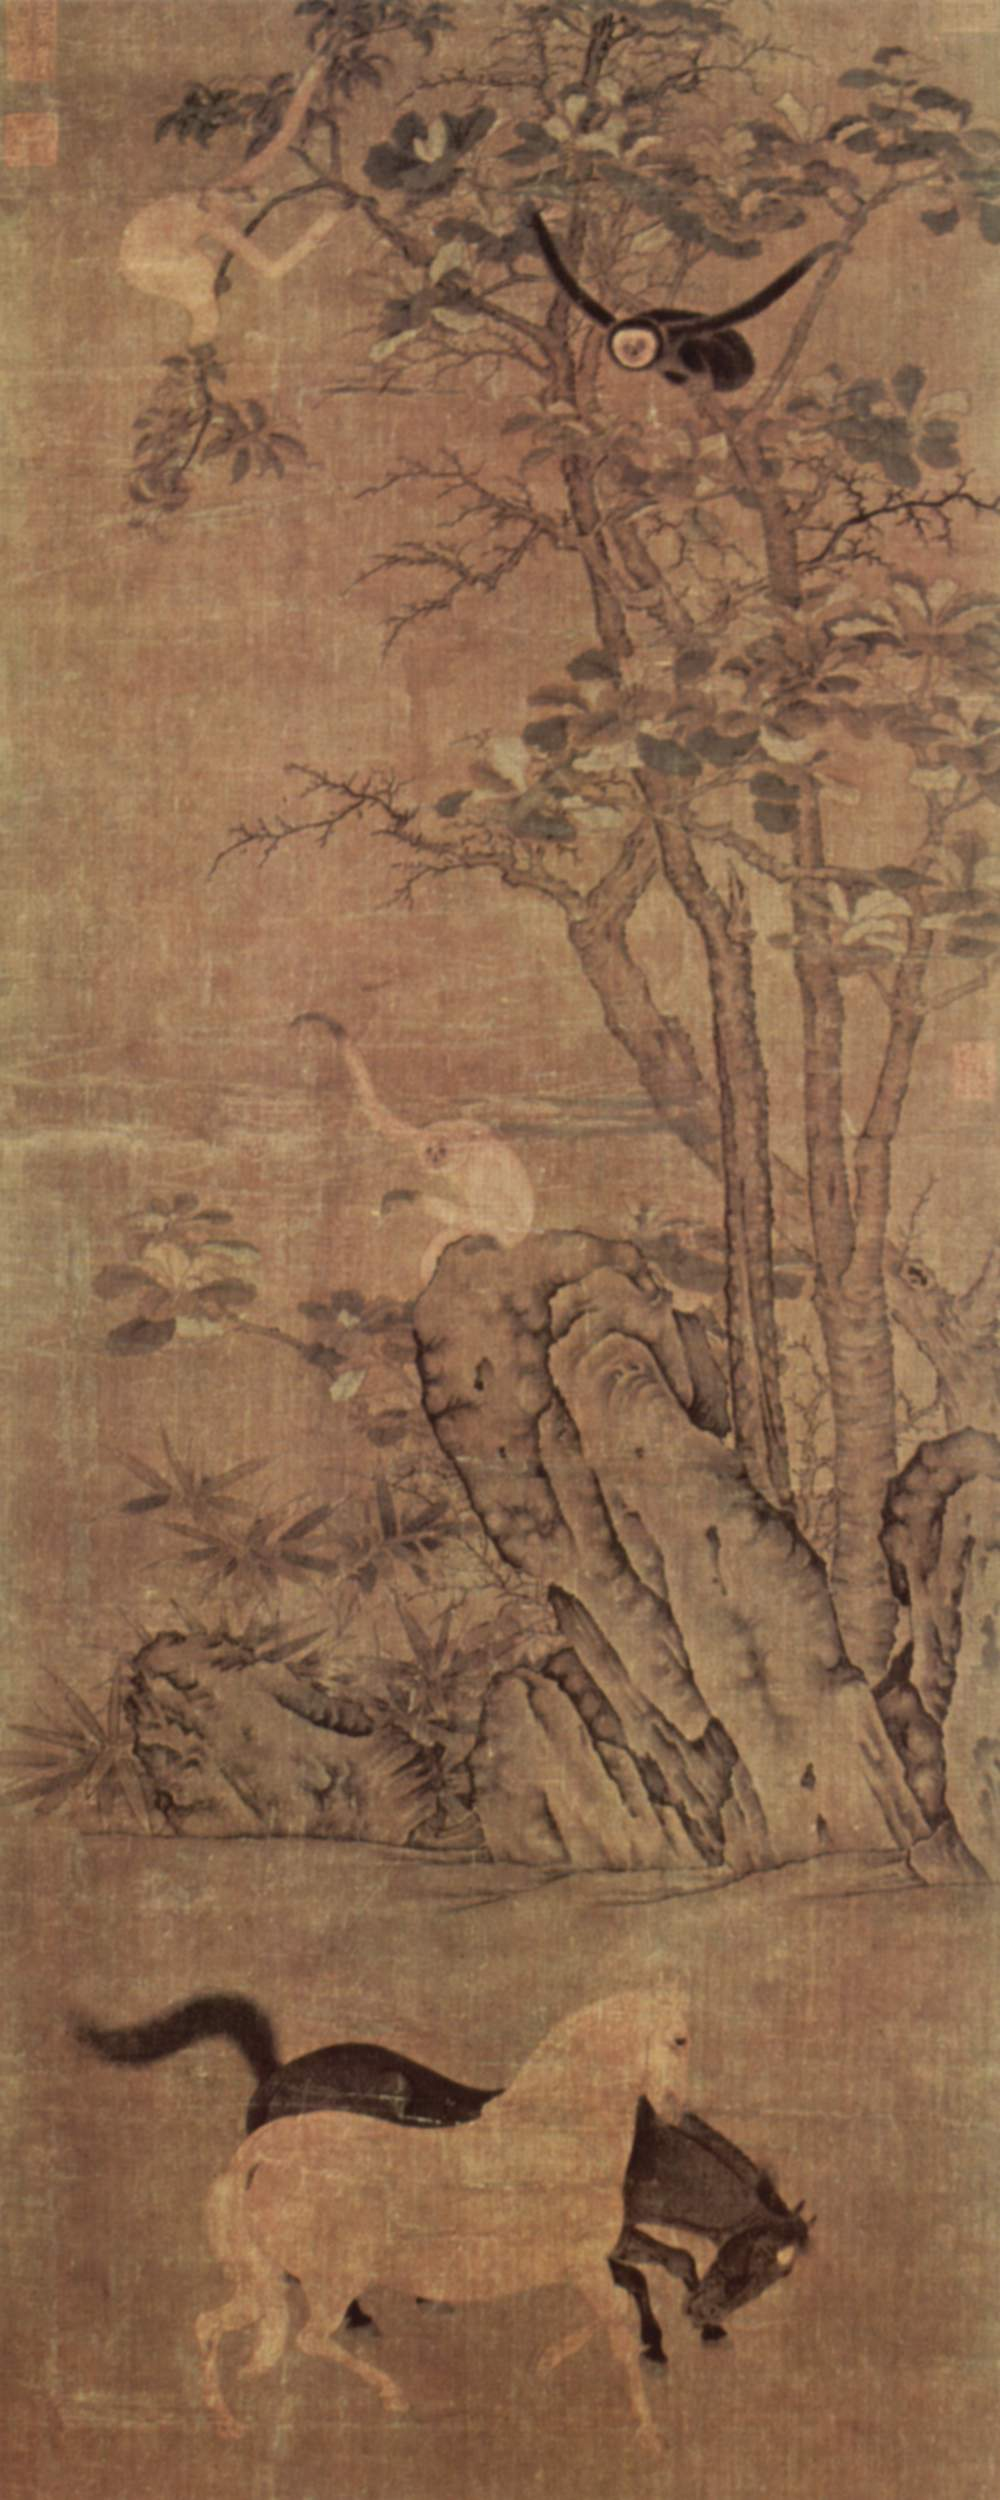 Guo Jin Geb 1964 Chinesischer Maler Zeitgenossische Kunst